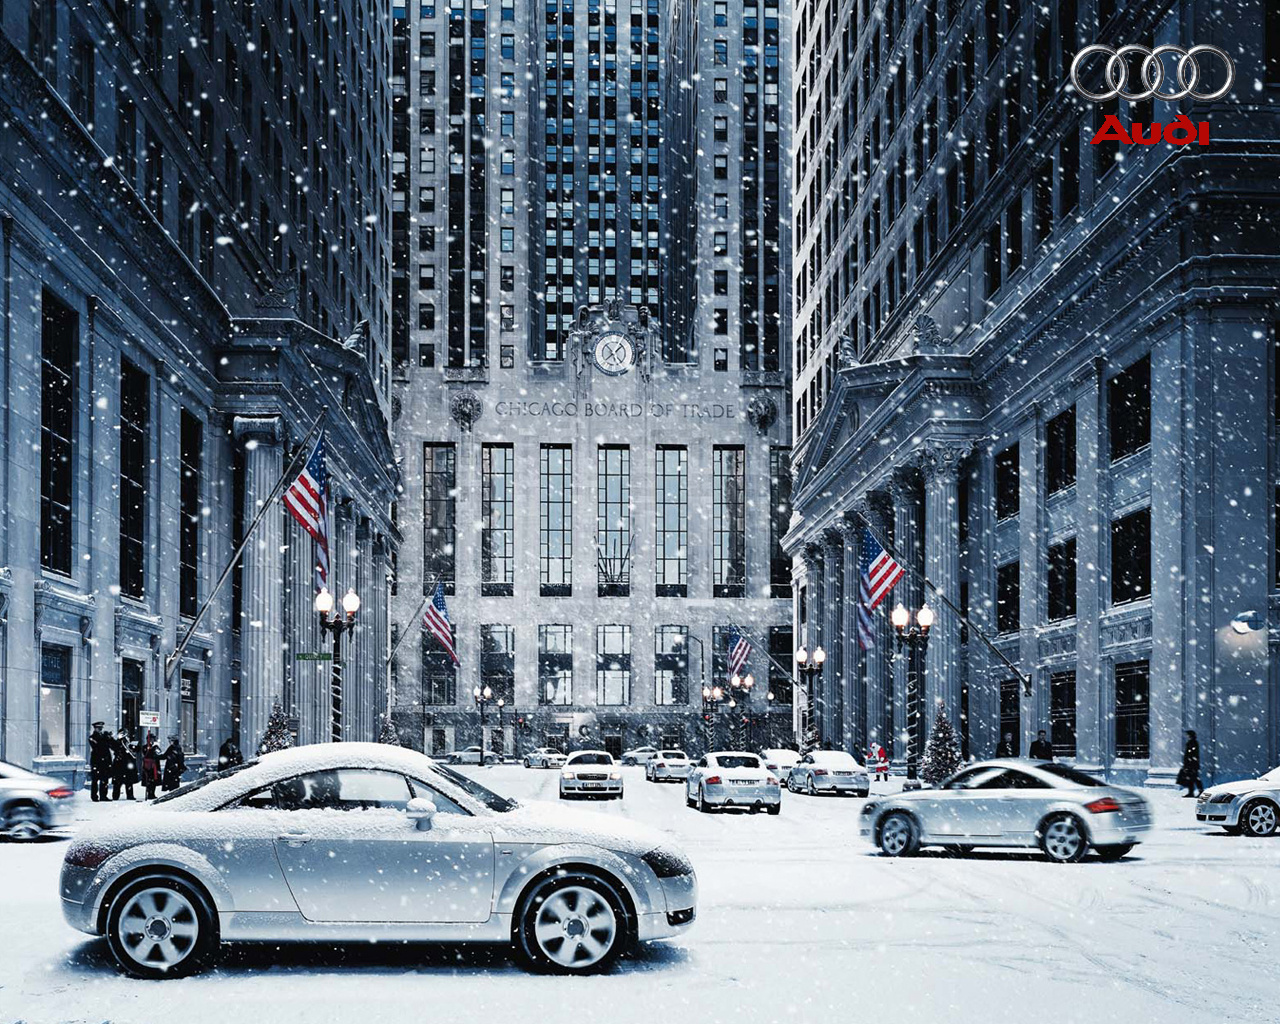 Photo Audi Tt Holiday Press Pic Audi Tt Mk1 Wallpapers